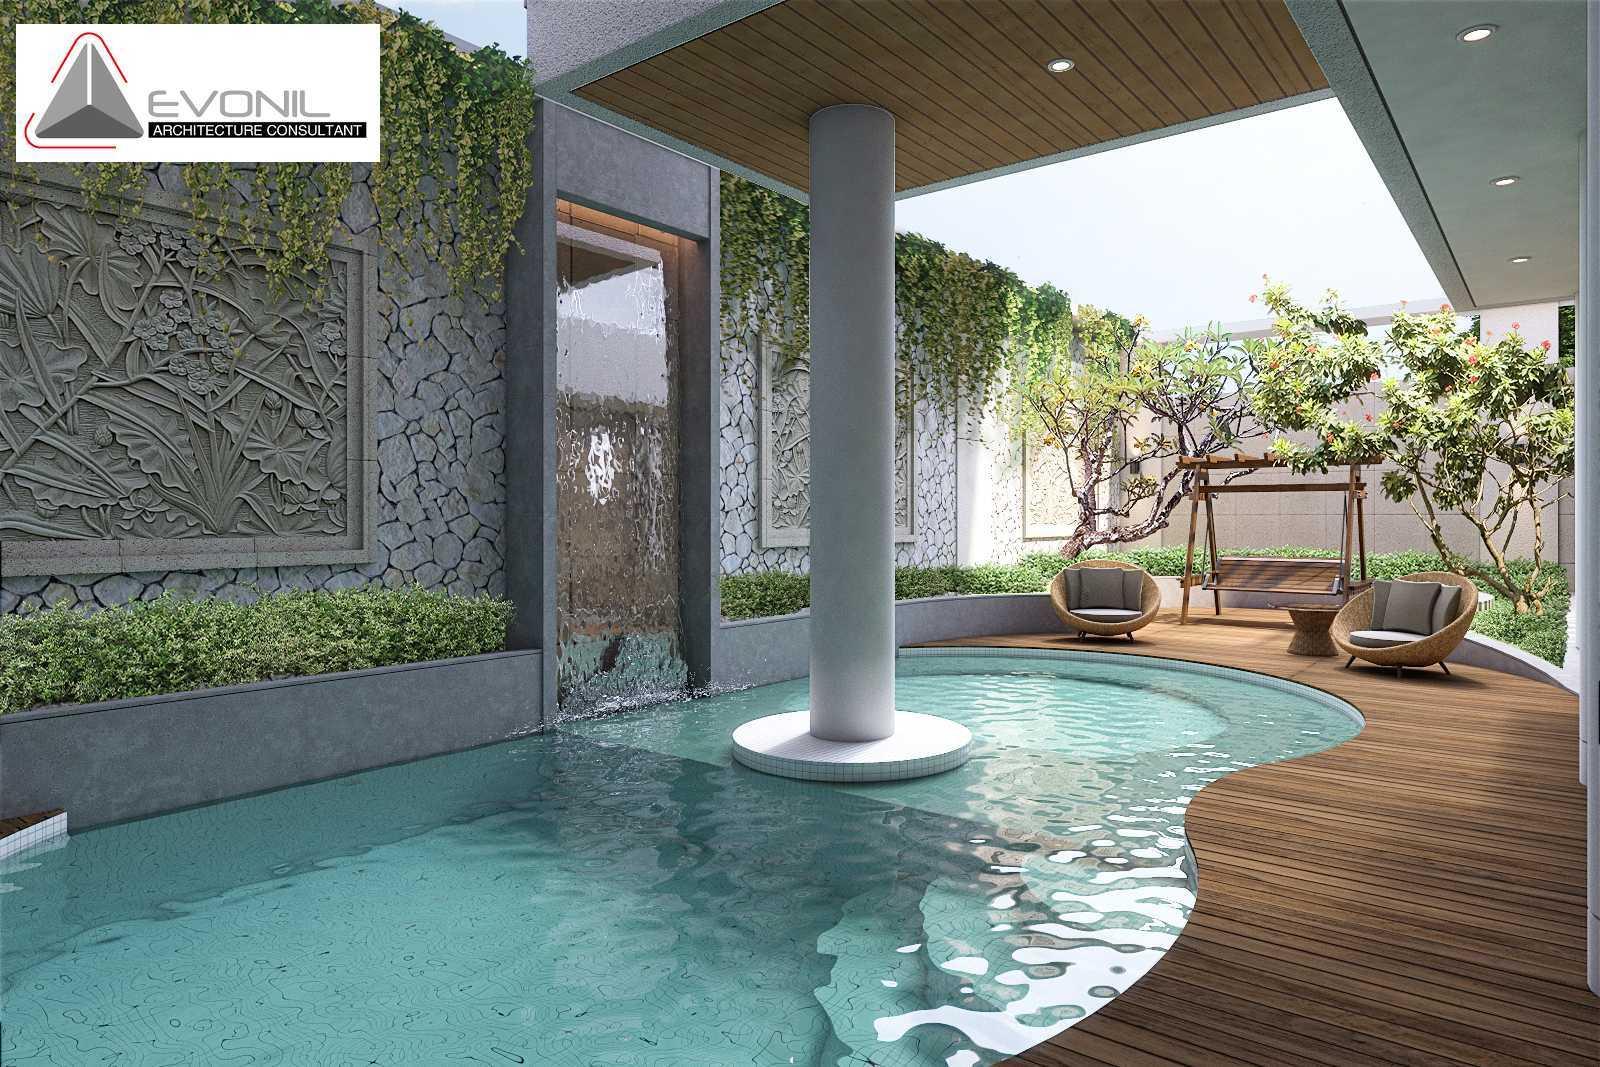 Evonil Architecture Residence Sunter Hijau Jakarta, Daerah Khusus Ibukota Jakarta, Indonesia Jakarta, Daerah Khusus Ibukota Jakarta, Indonesia Evonil-Architecture-Residence-Sunter-Hijau  83999